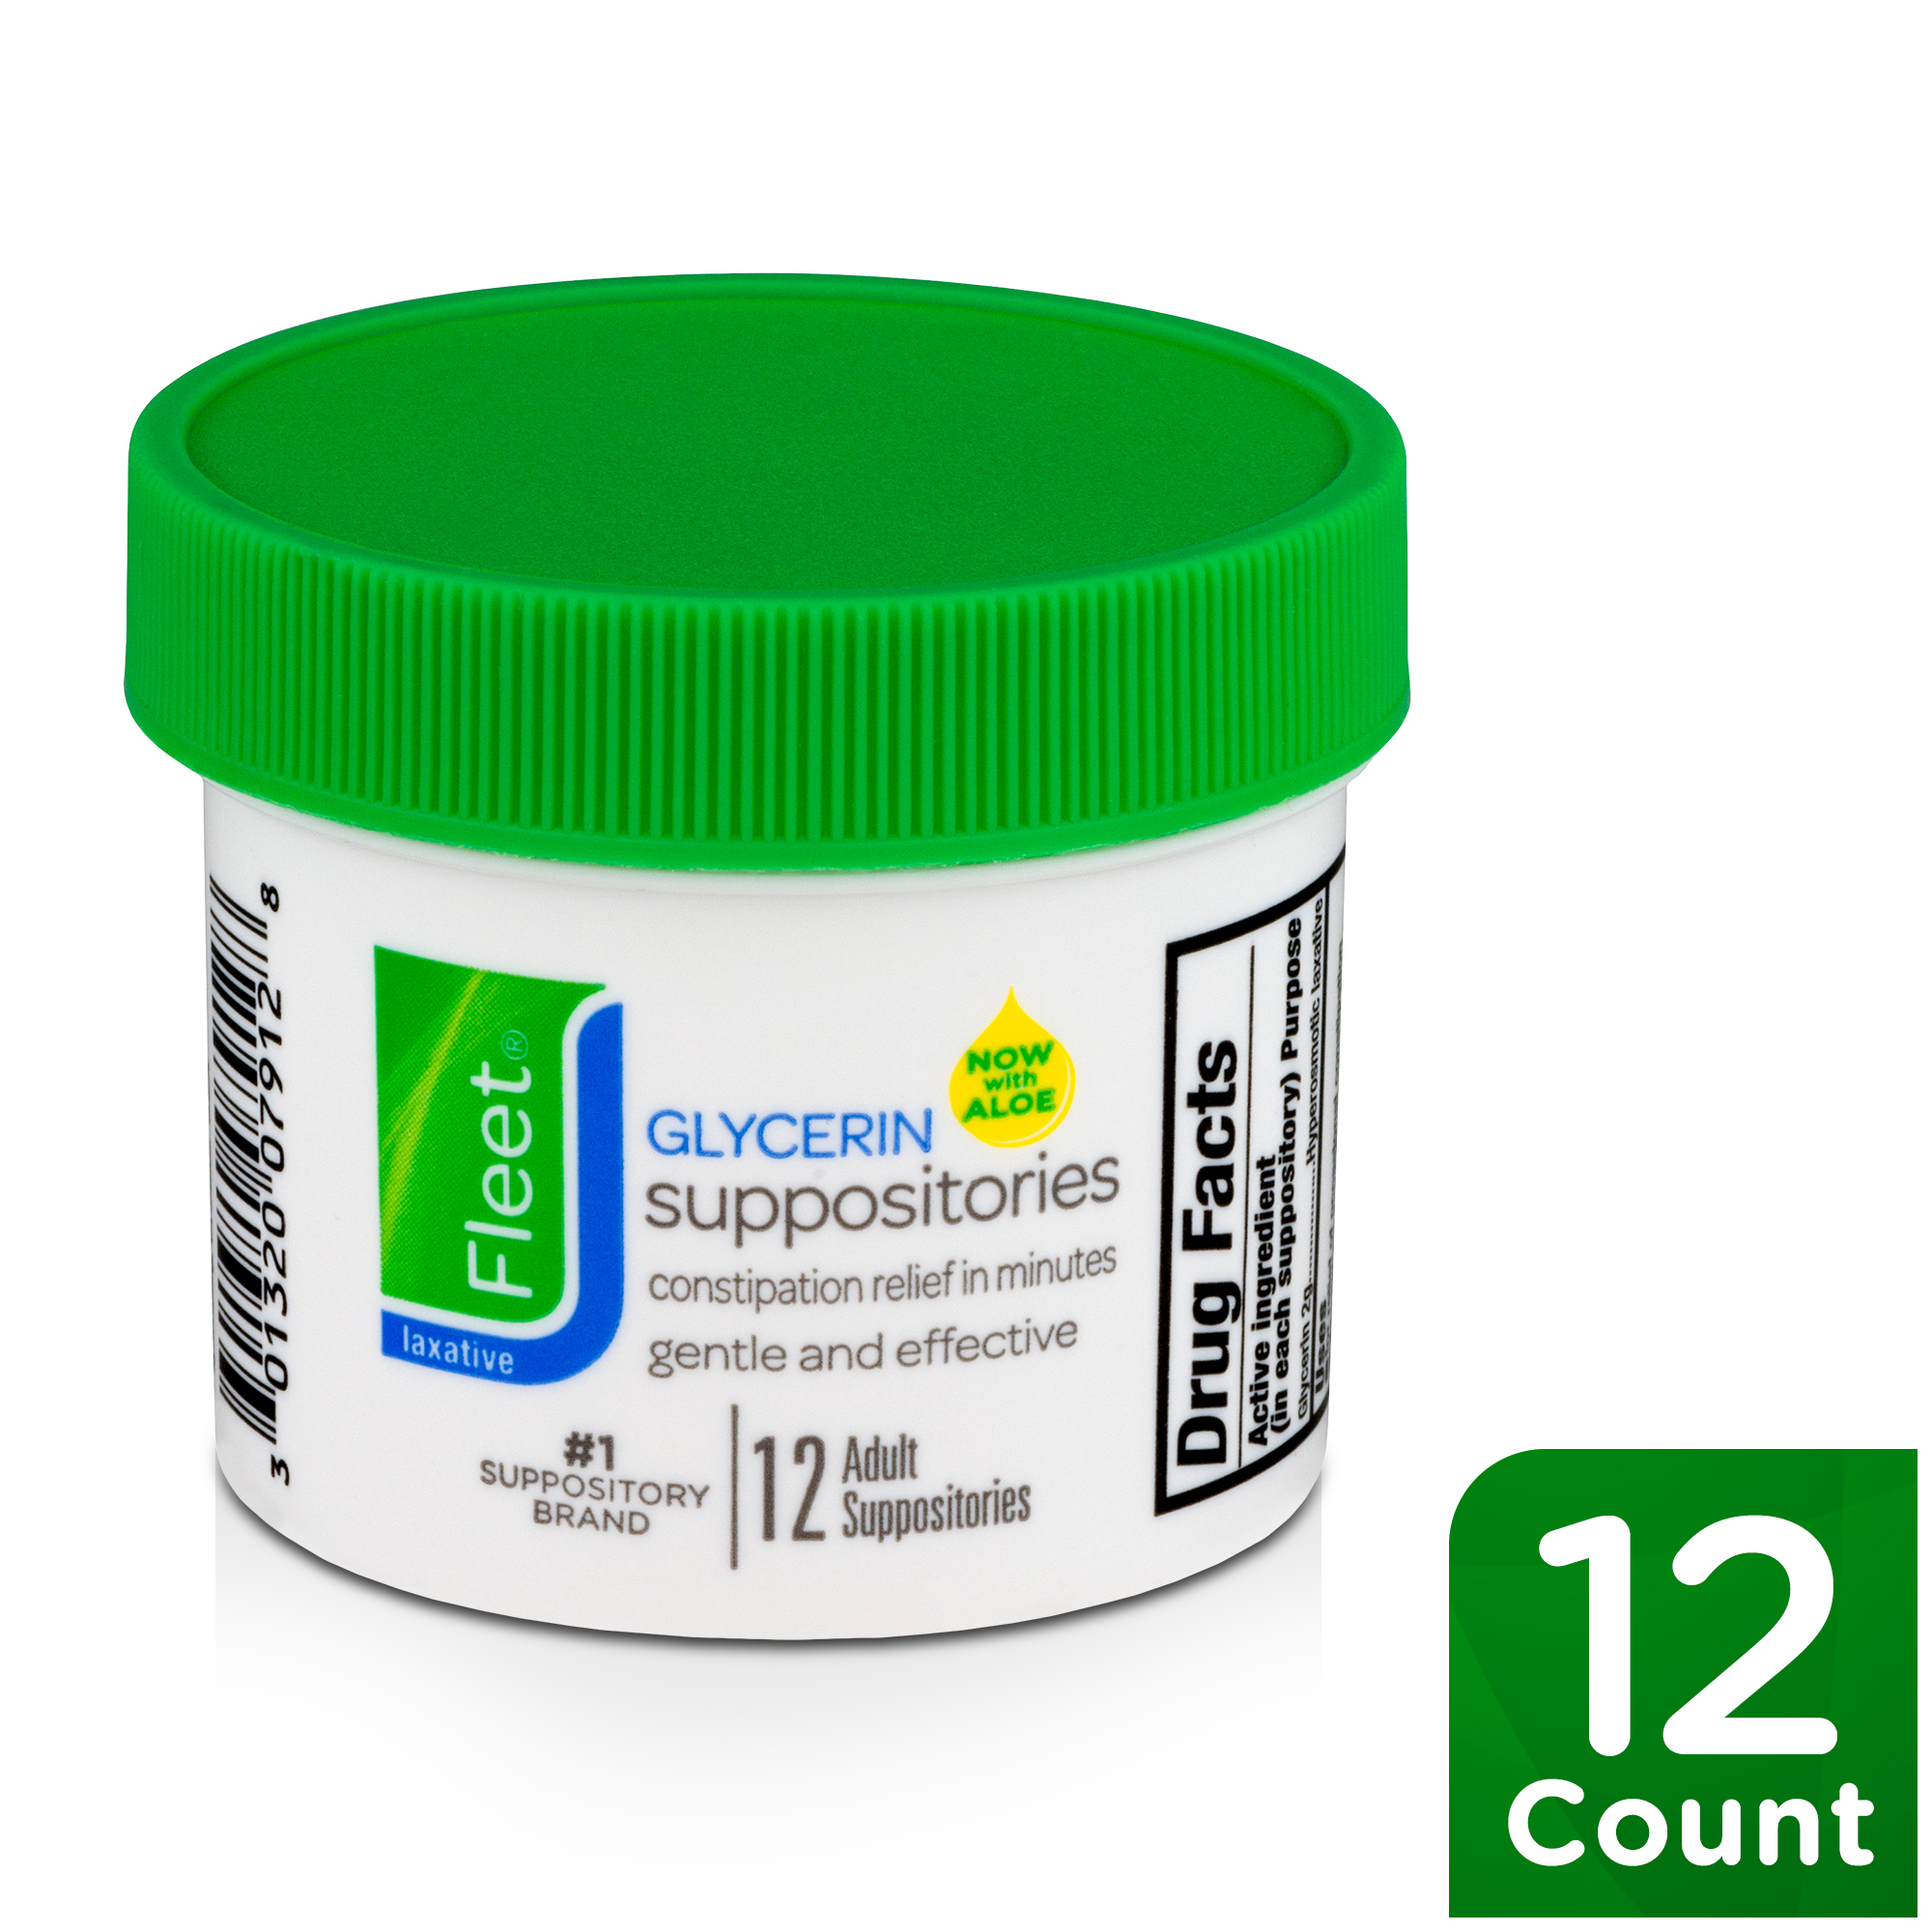 Fleet Laxative Glycerin Suppositories for Adult Constipation. 12 Count - Walmart.com - Walmart.com